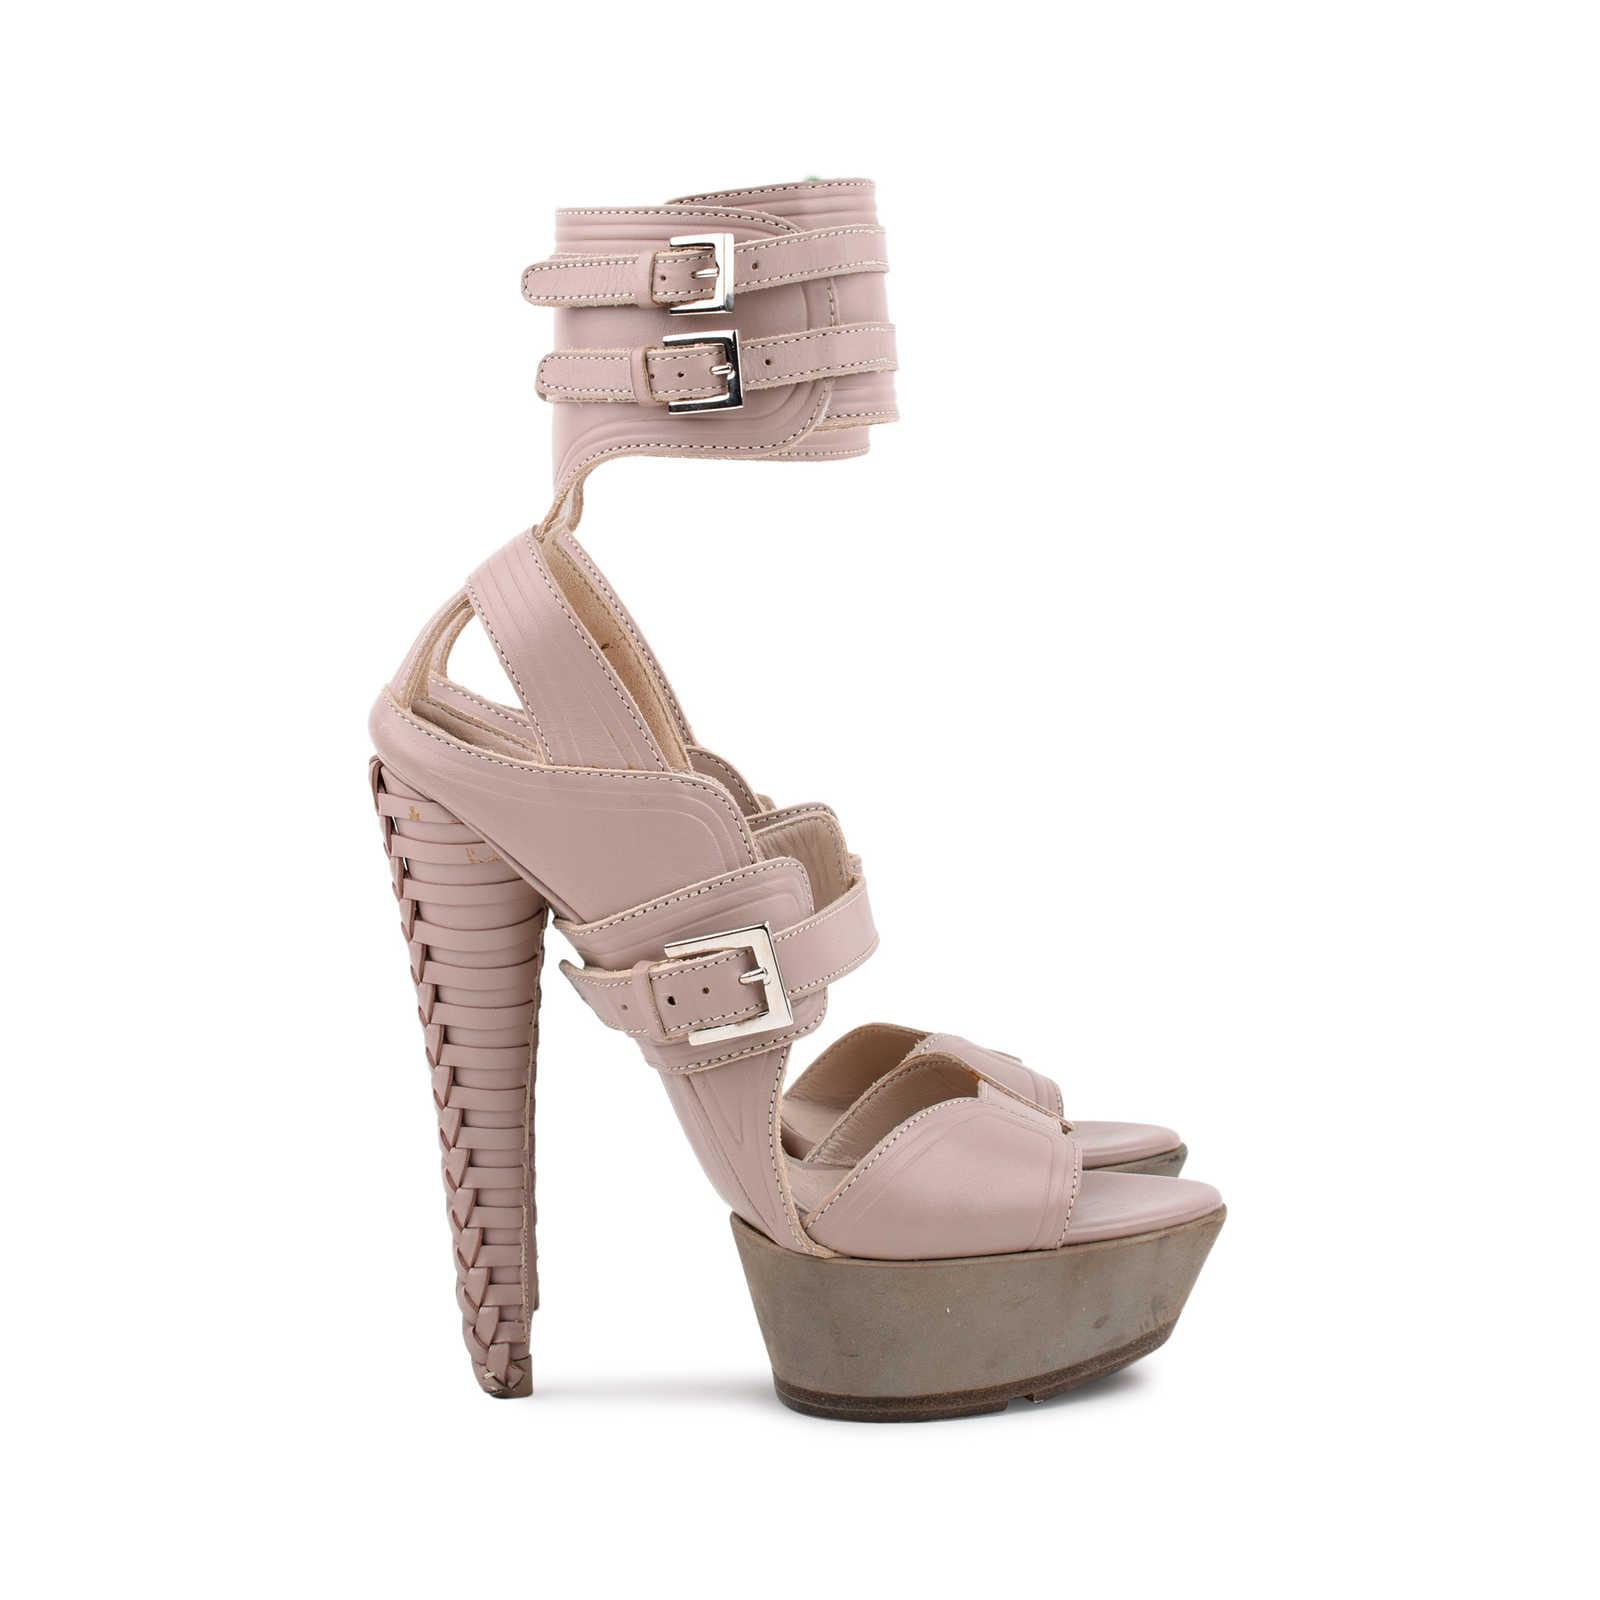 5e41bd96608 ... Authentic Second Hand Salvatore Ferragamo Braided Platform Sandal (PSS- 080-00221) ...